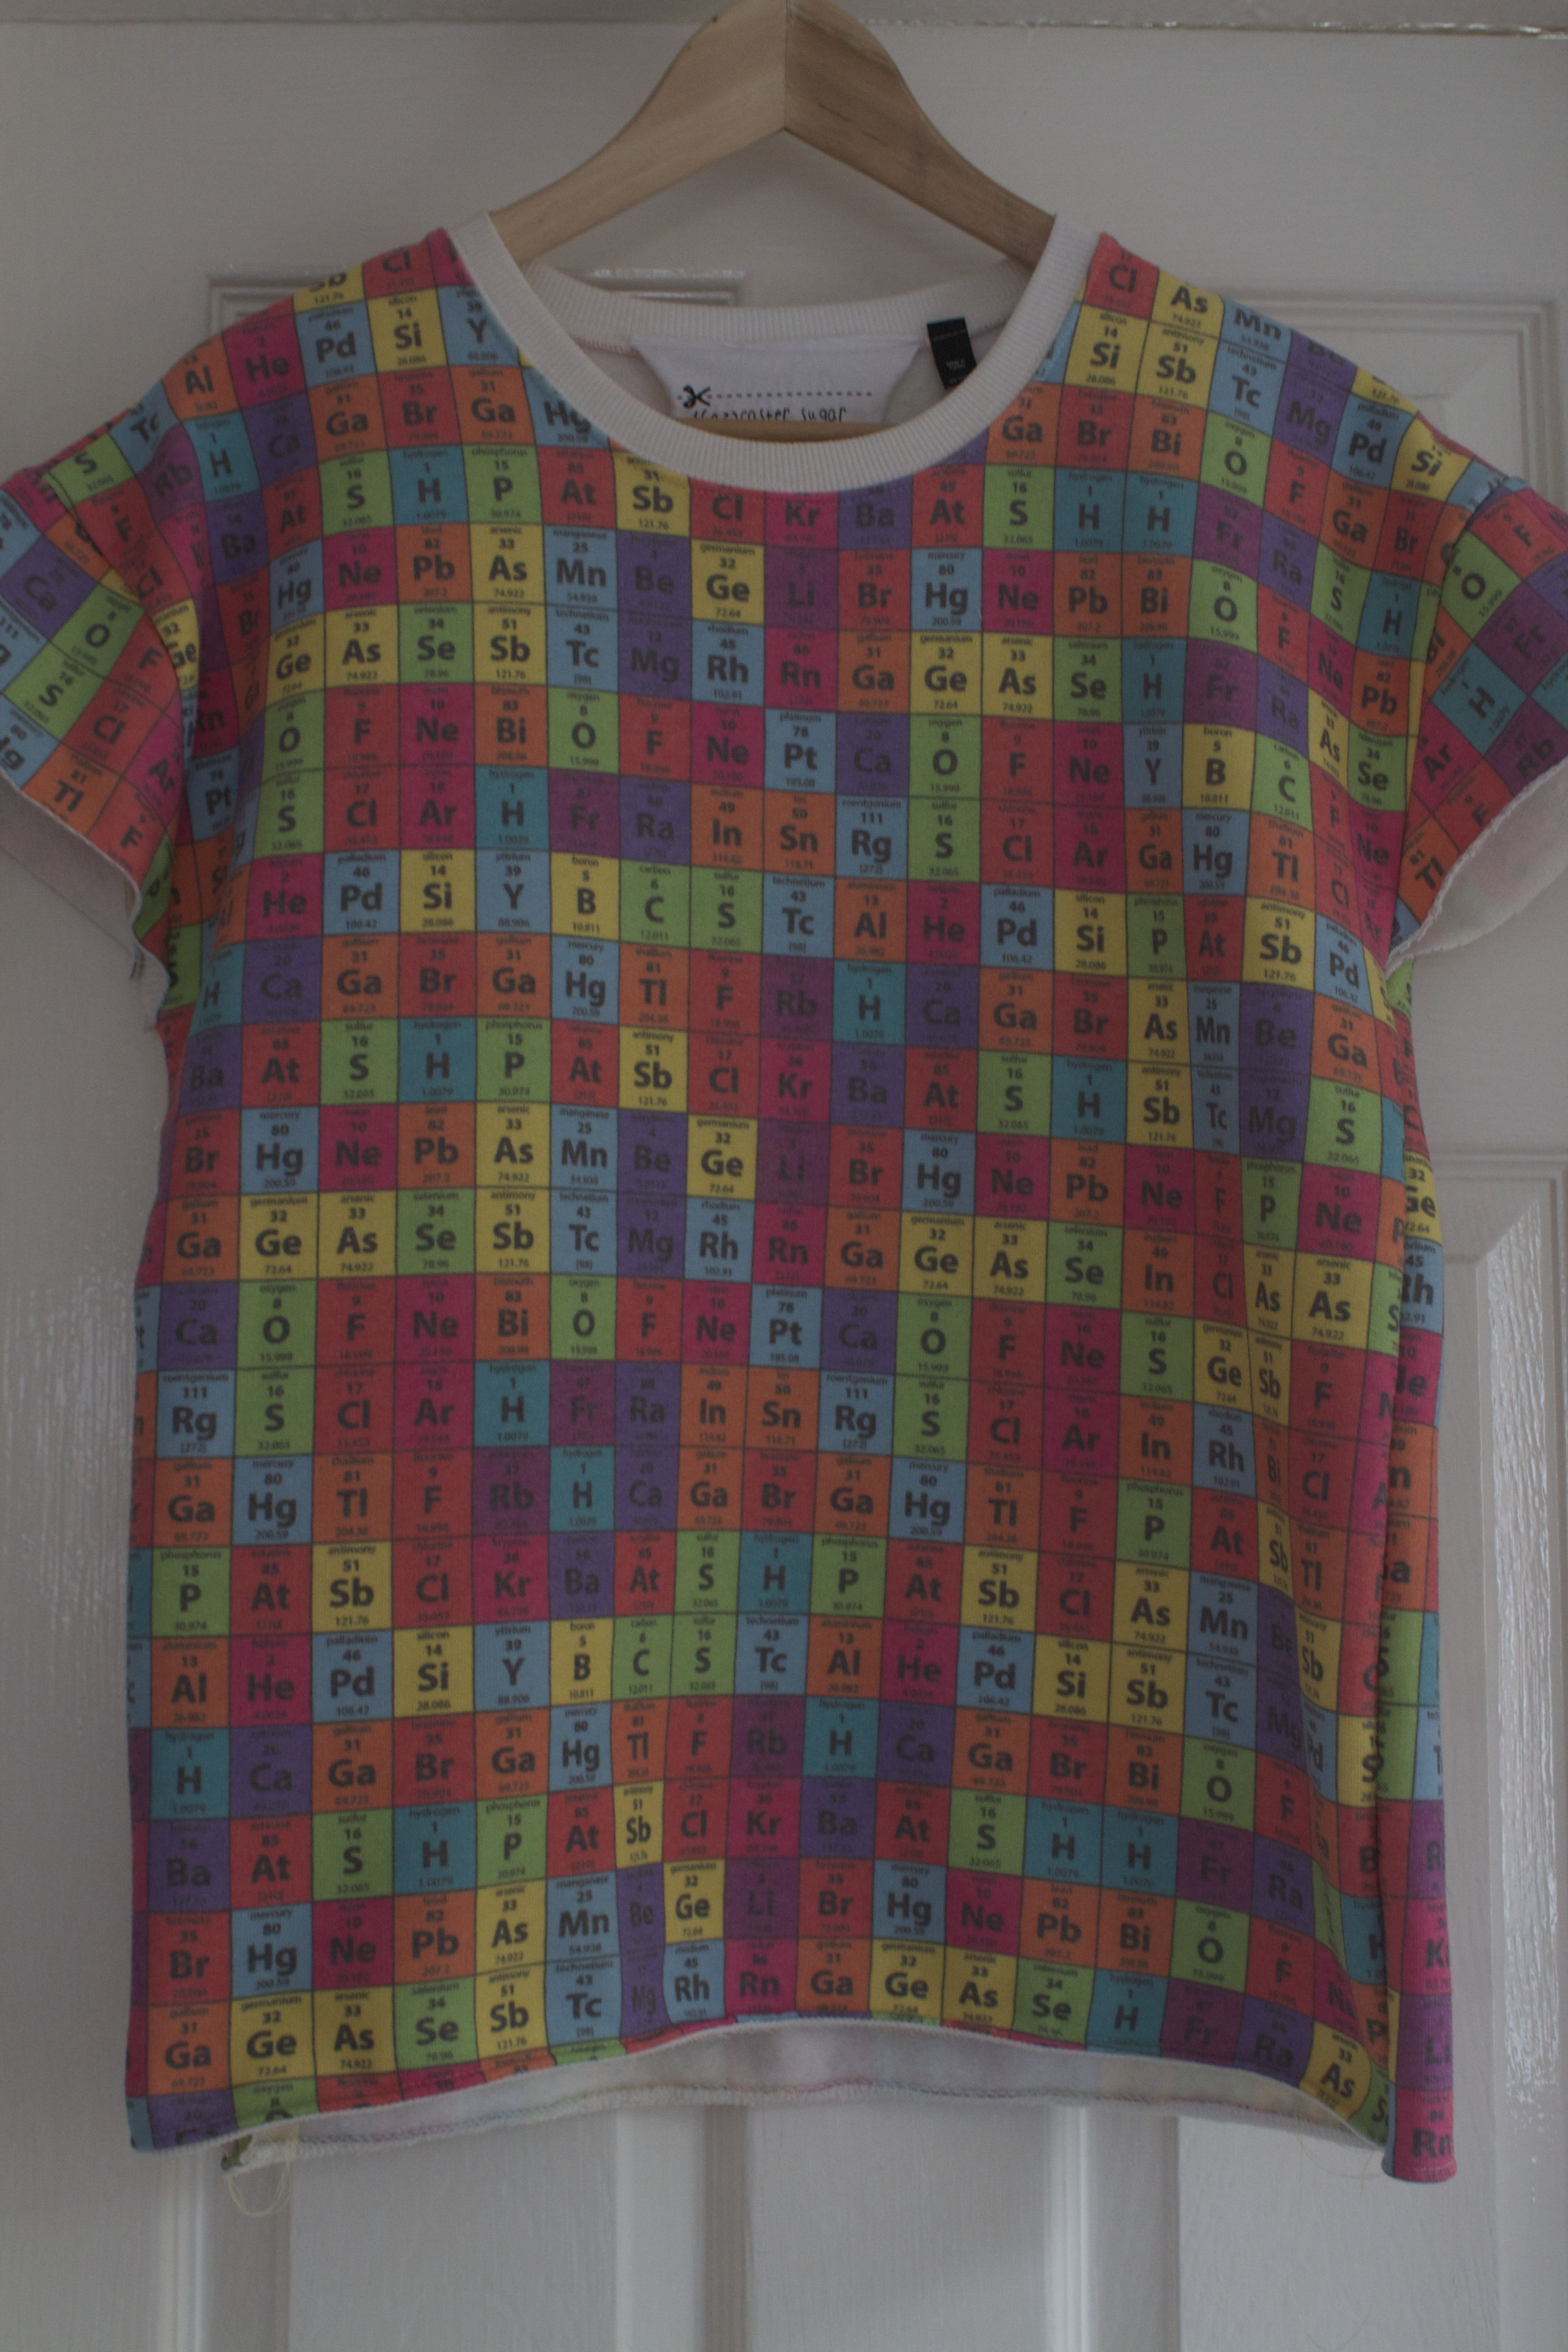 Scientific scrabble jumper  #design #textiles #recycle #diy #craft #thrifty #ebay #sustainable